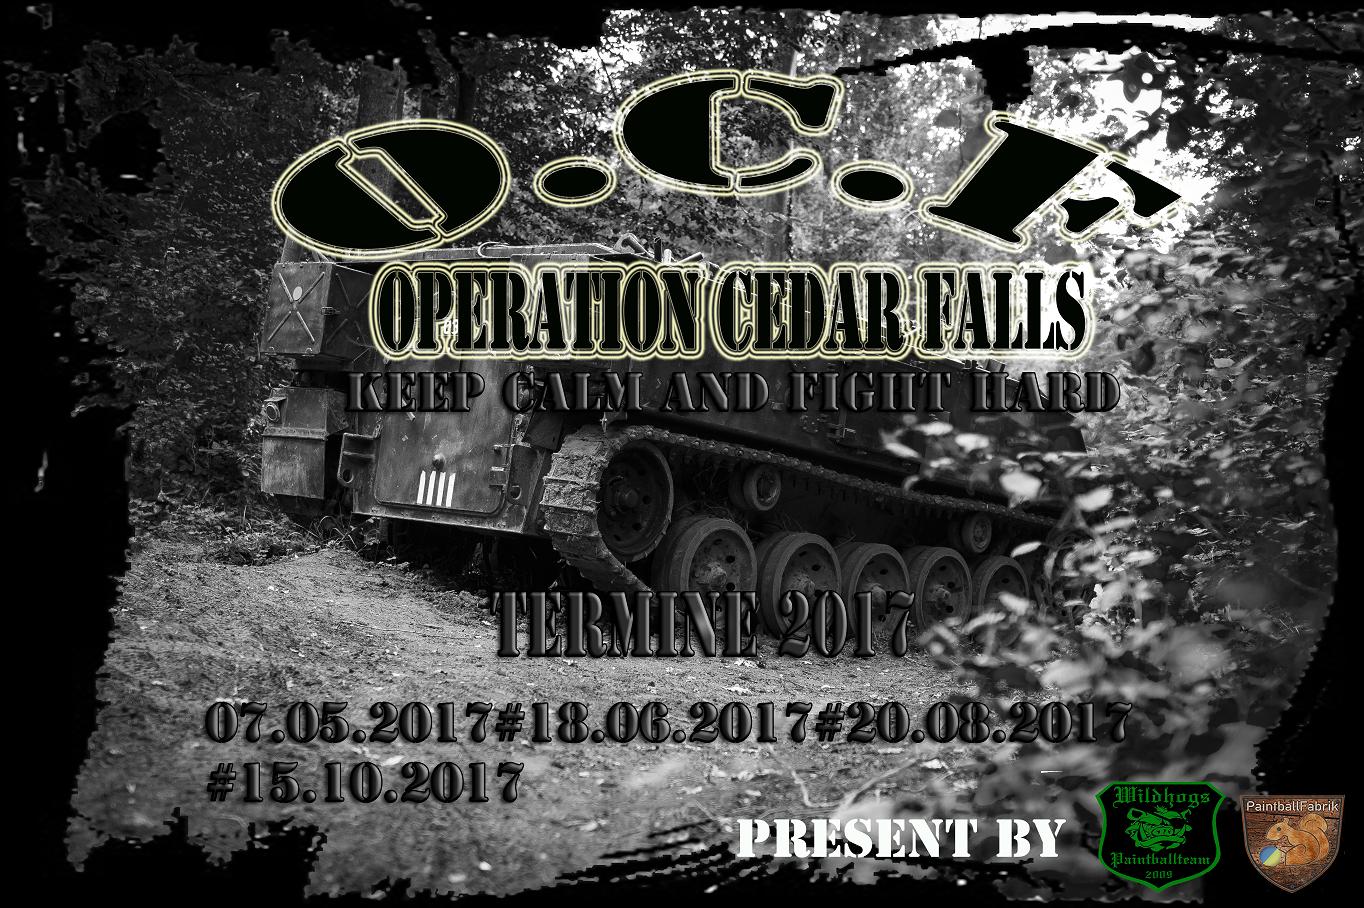 OCF 2017 Termine